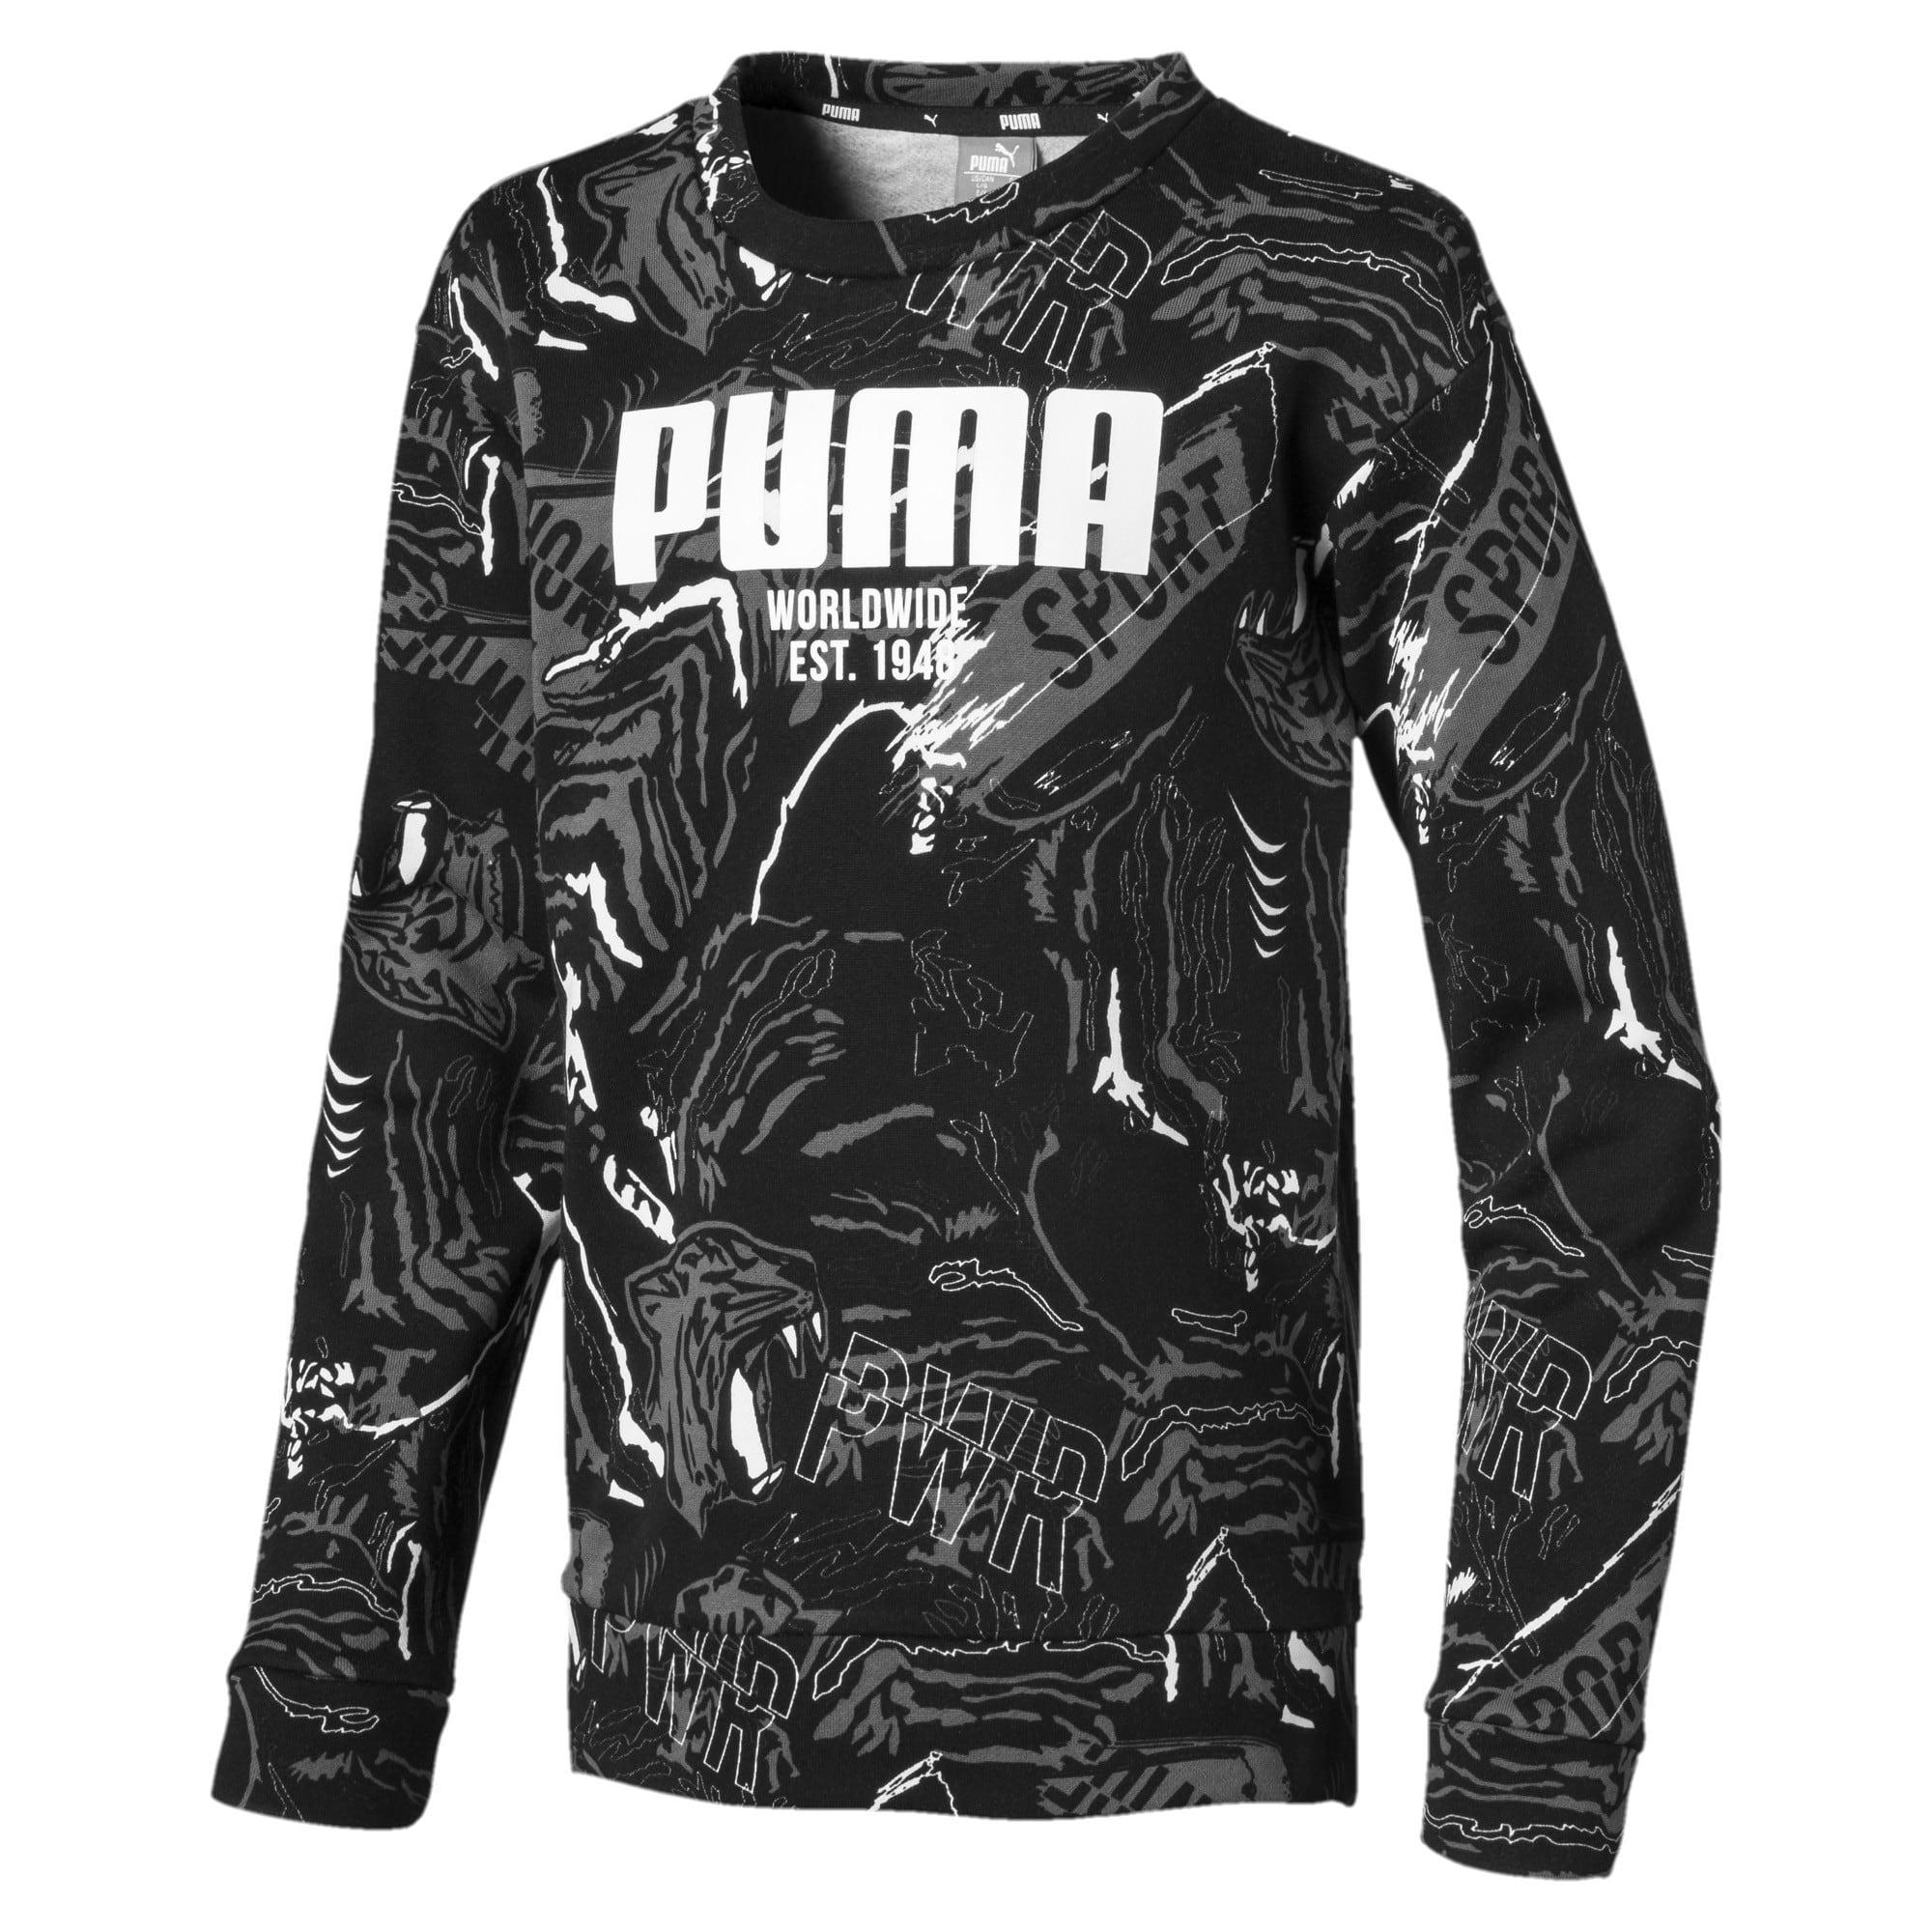 Thumbnail 1 of Alpha Graphic Long Sleeve Boys' Shirt, Puma Black, medium-IND